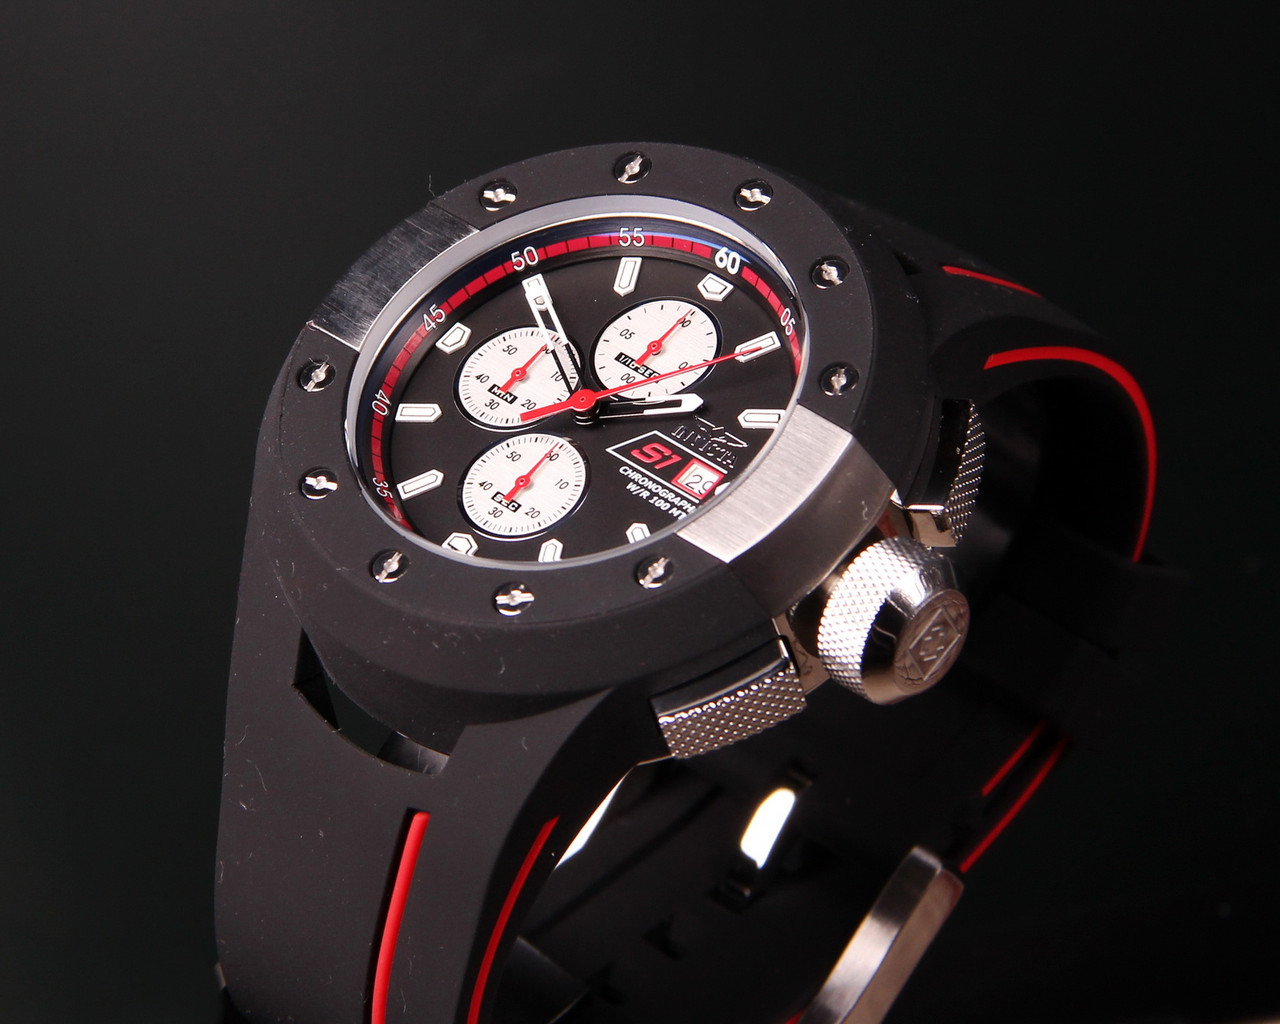 a16c87c01b32 Мужские часы Invicta 22434 S1 Rally, цена 5 046 грн., купить в ...